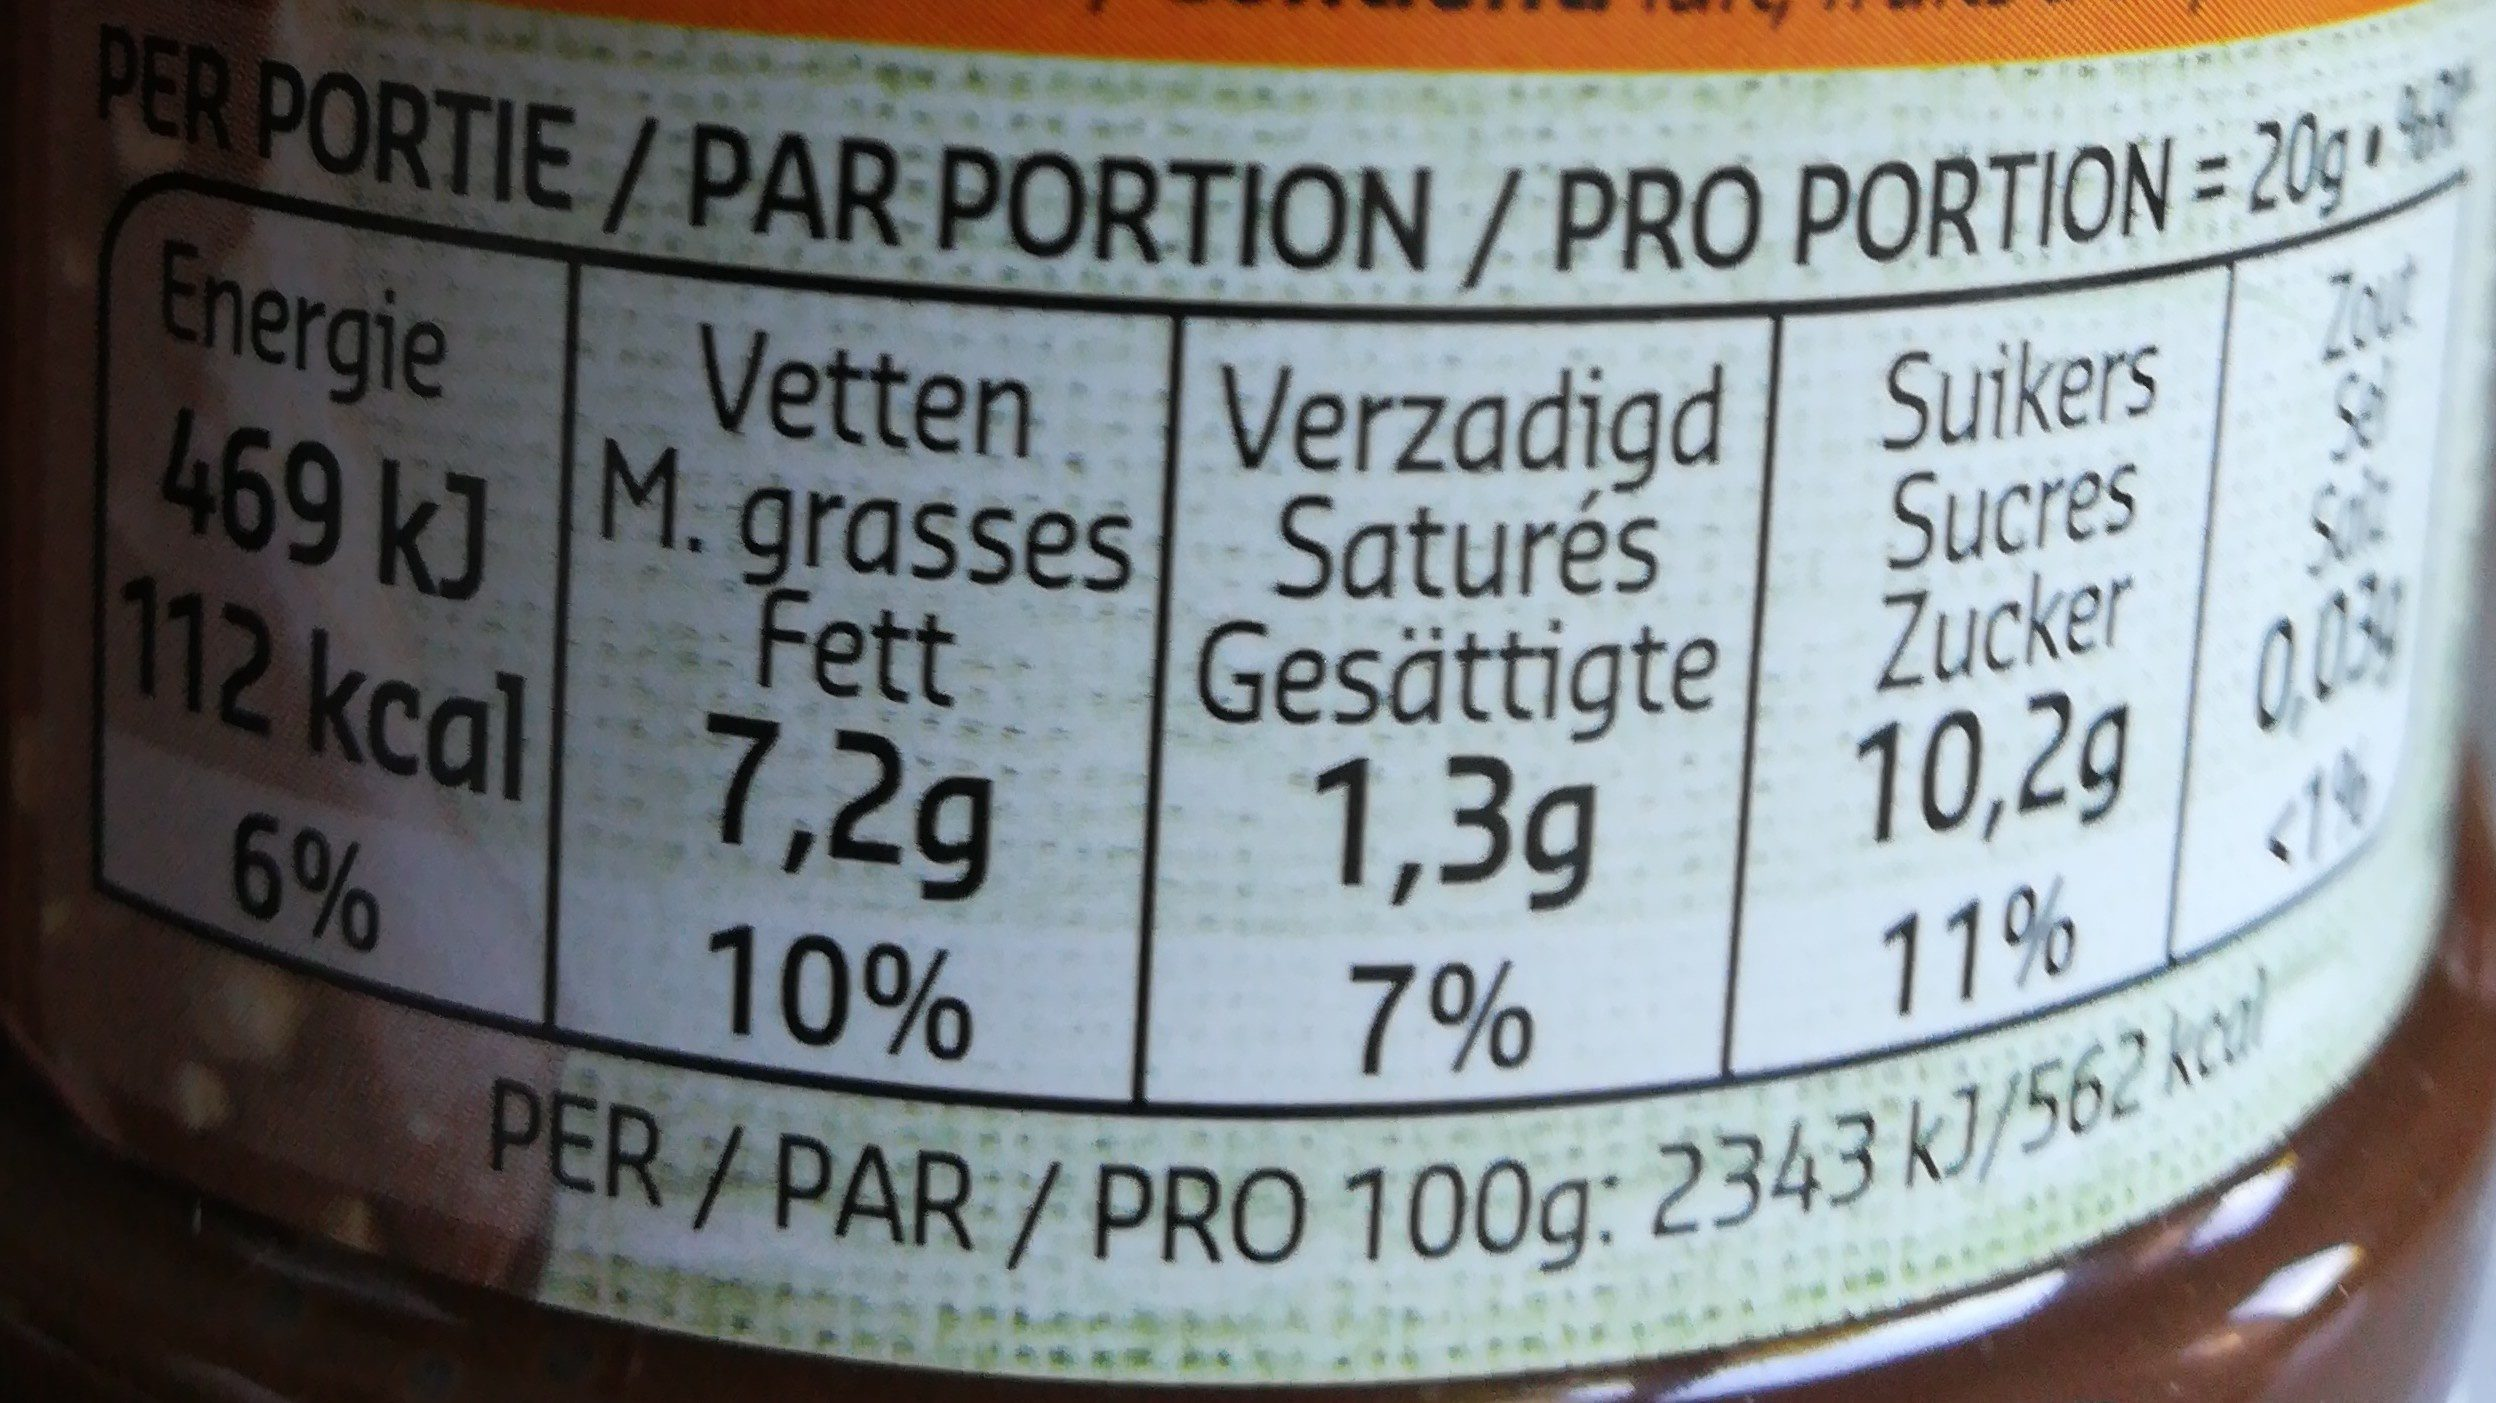 Pâte à tartiner crunchy - Nutrition facts